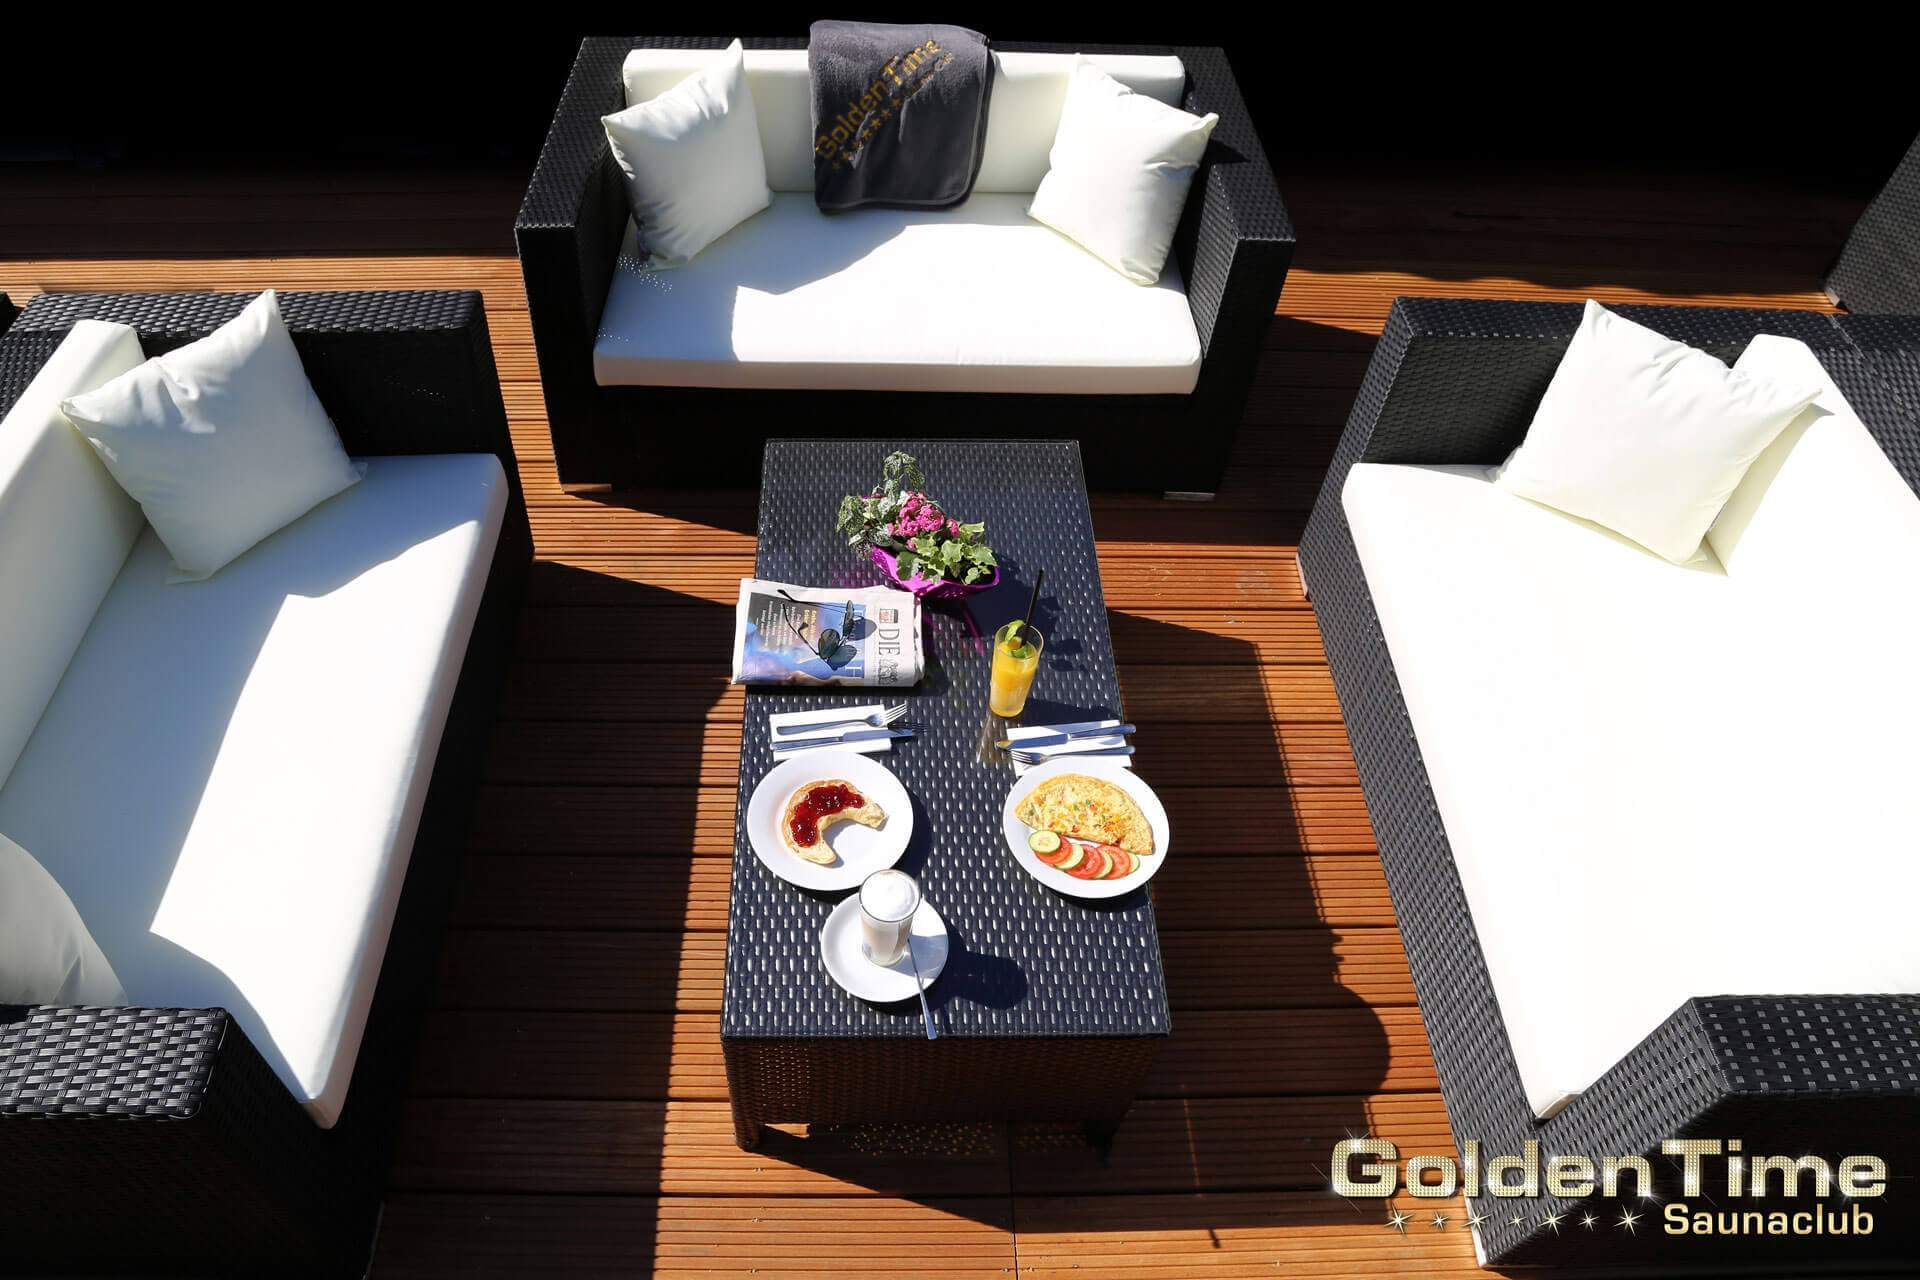 01-terrasse-pic-02-goldentime-saunaclub.jpg